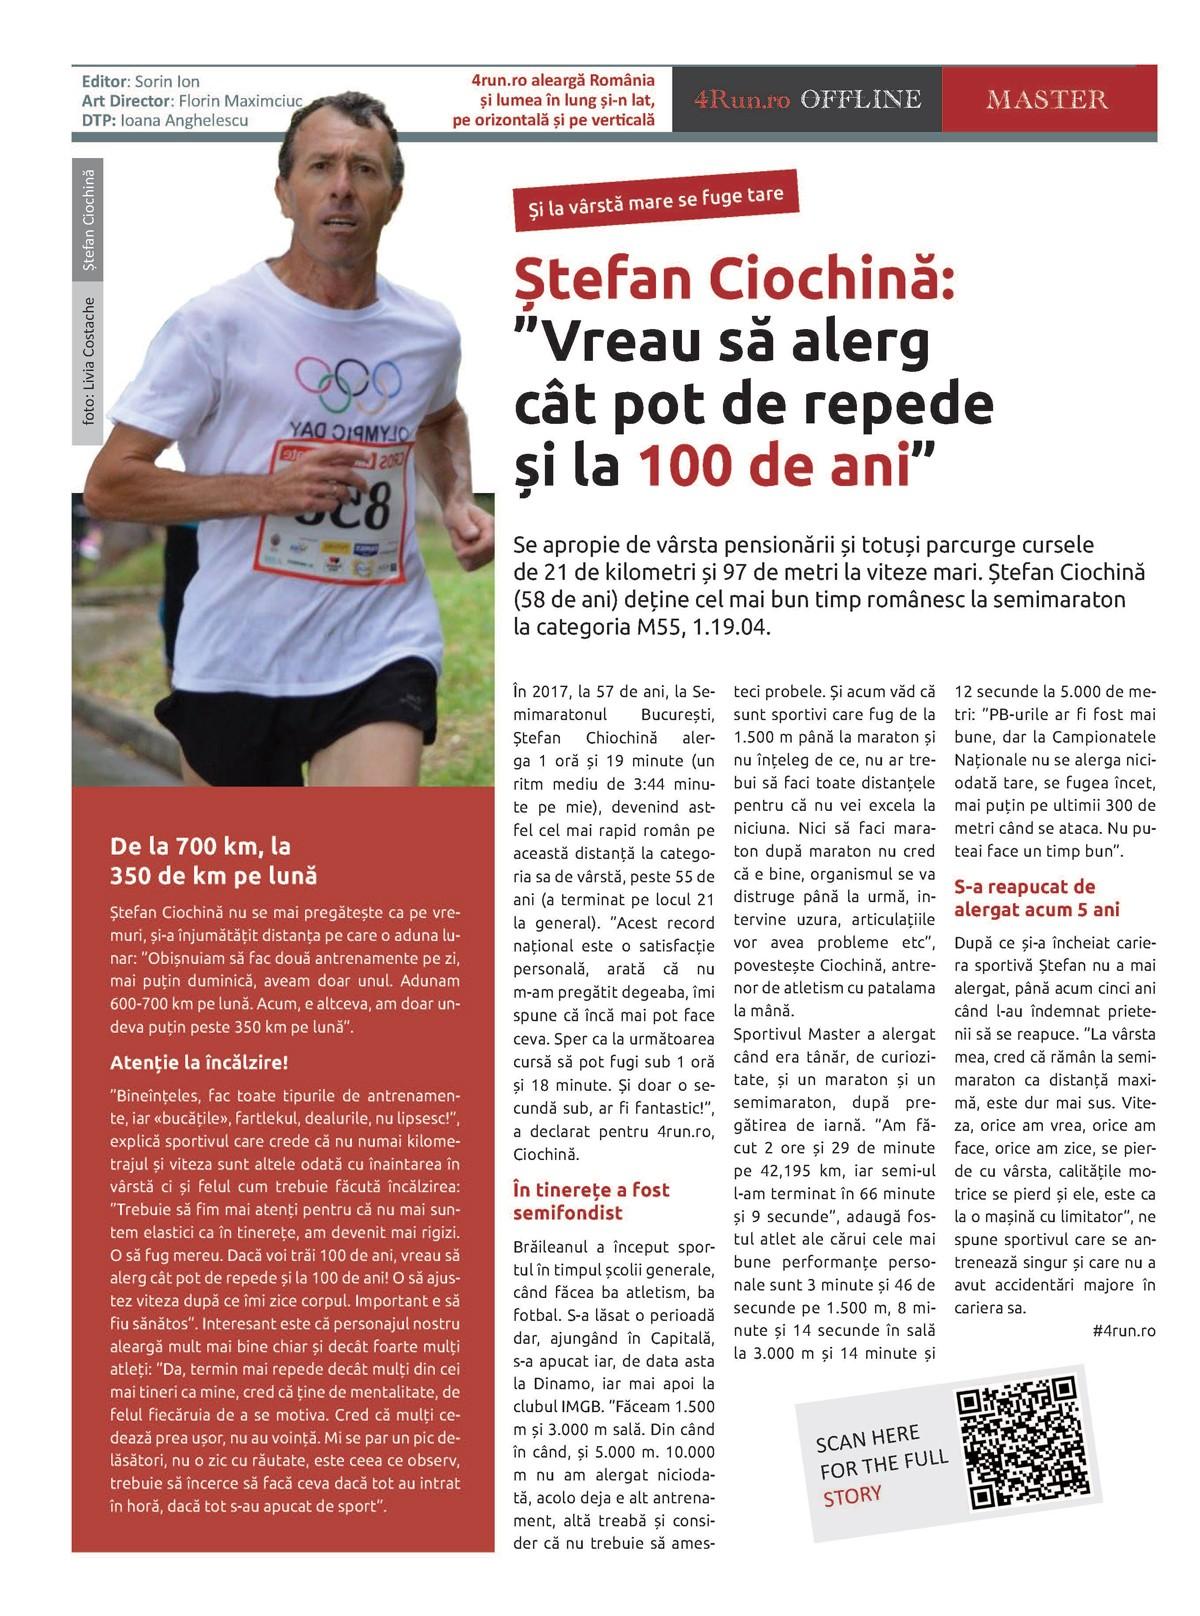 Pagina 8, ziarul 4run.ro OFFLINE